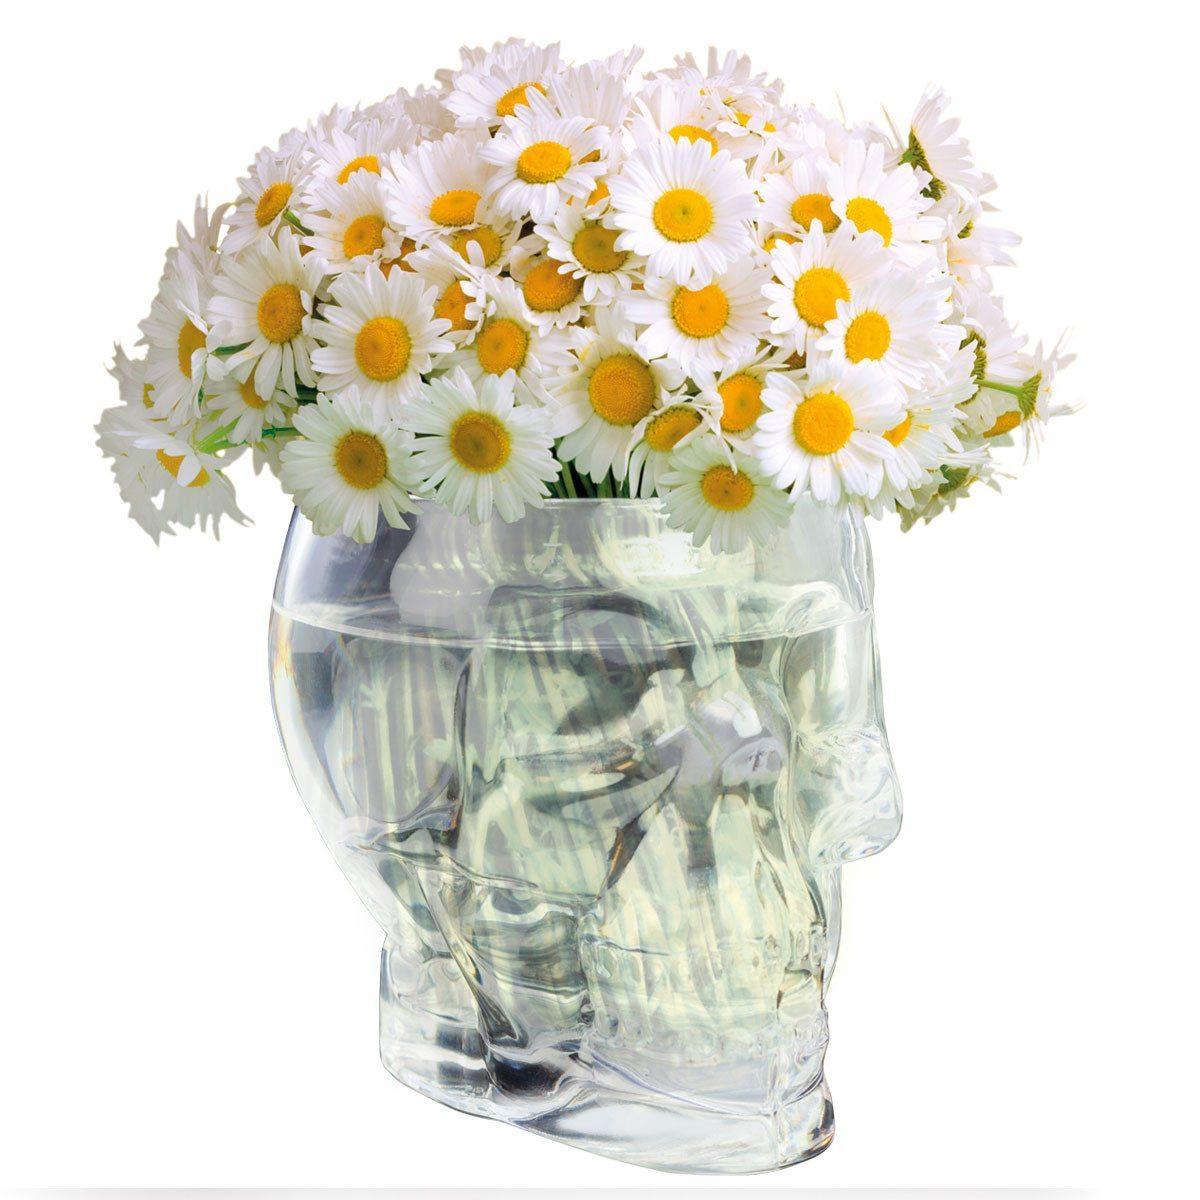 Totenkopf Vase